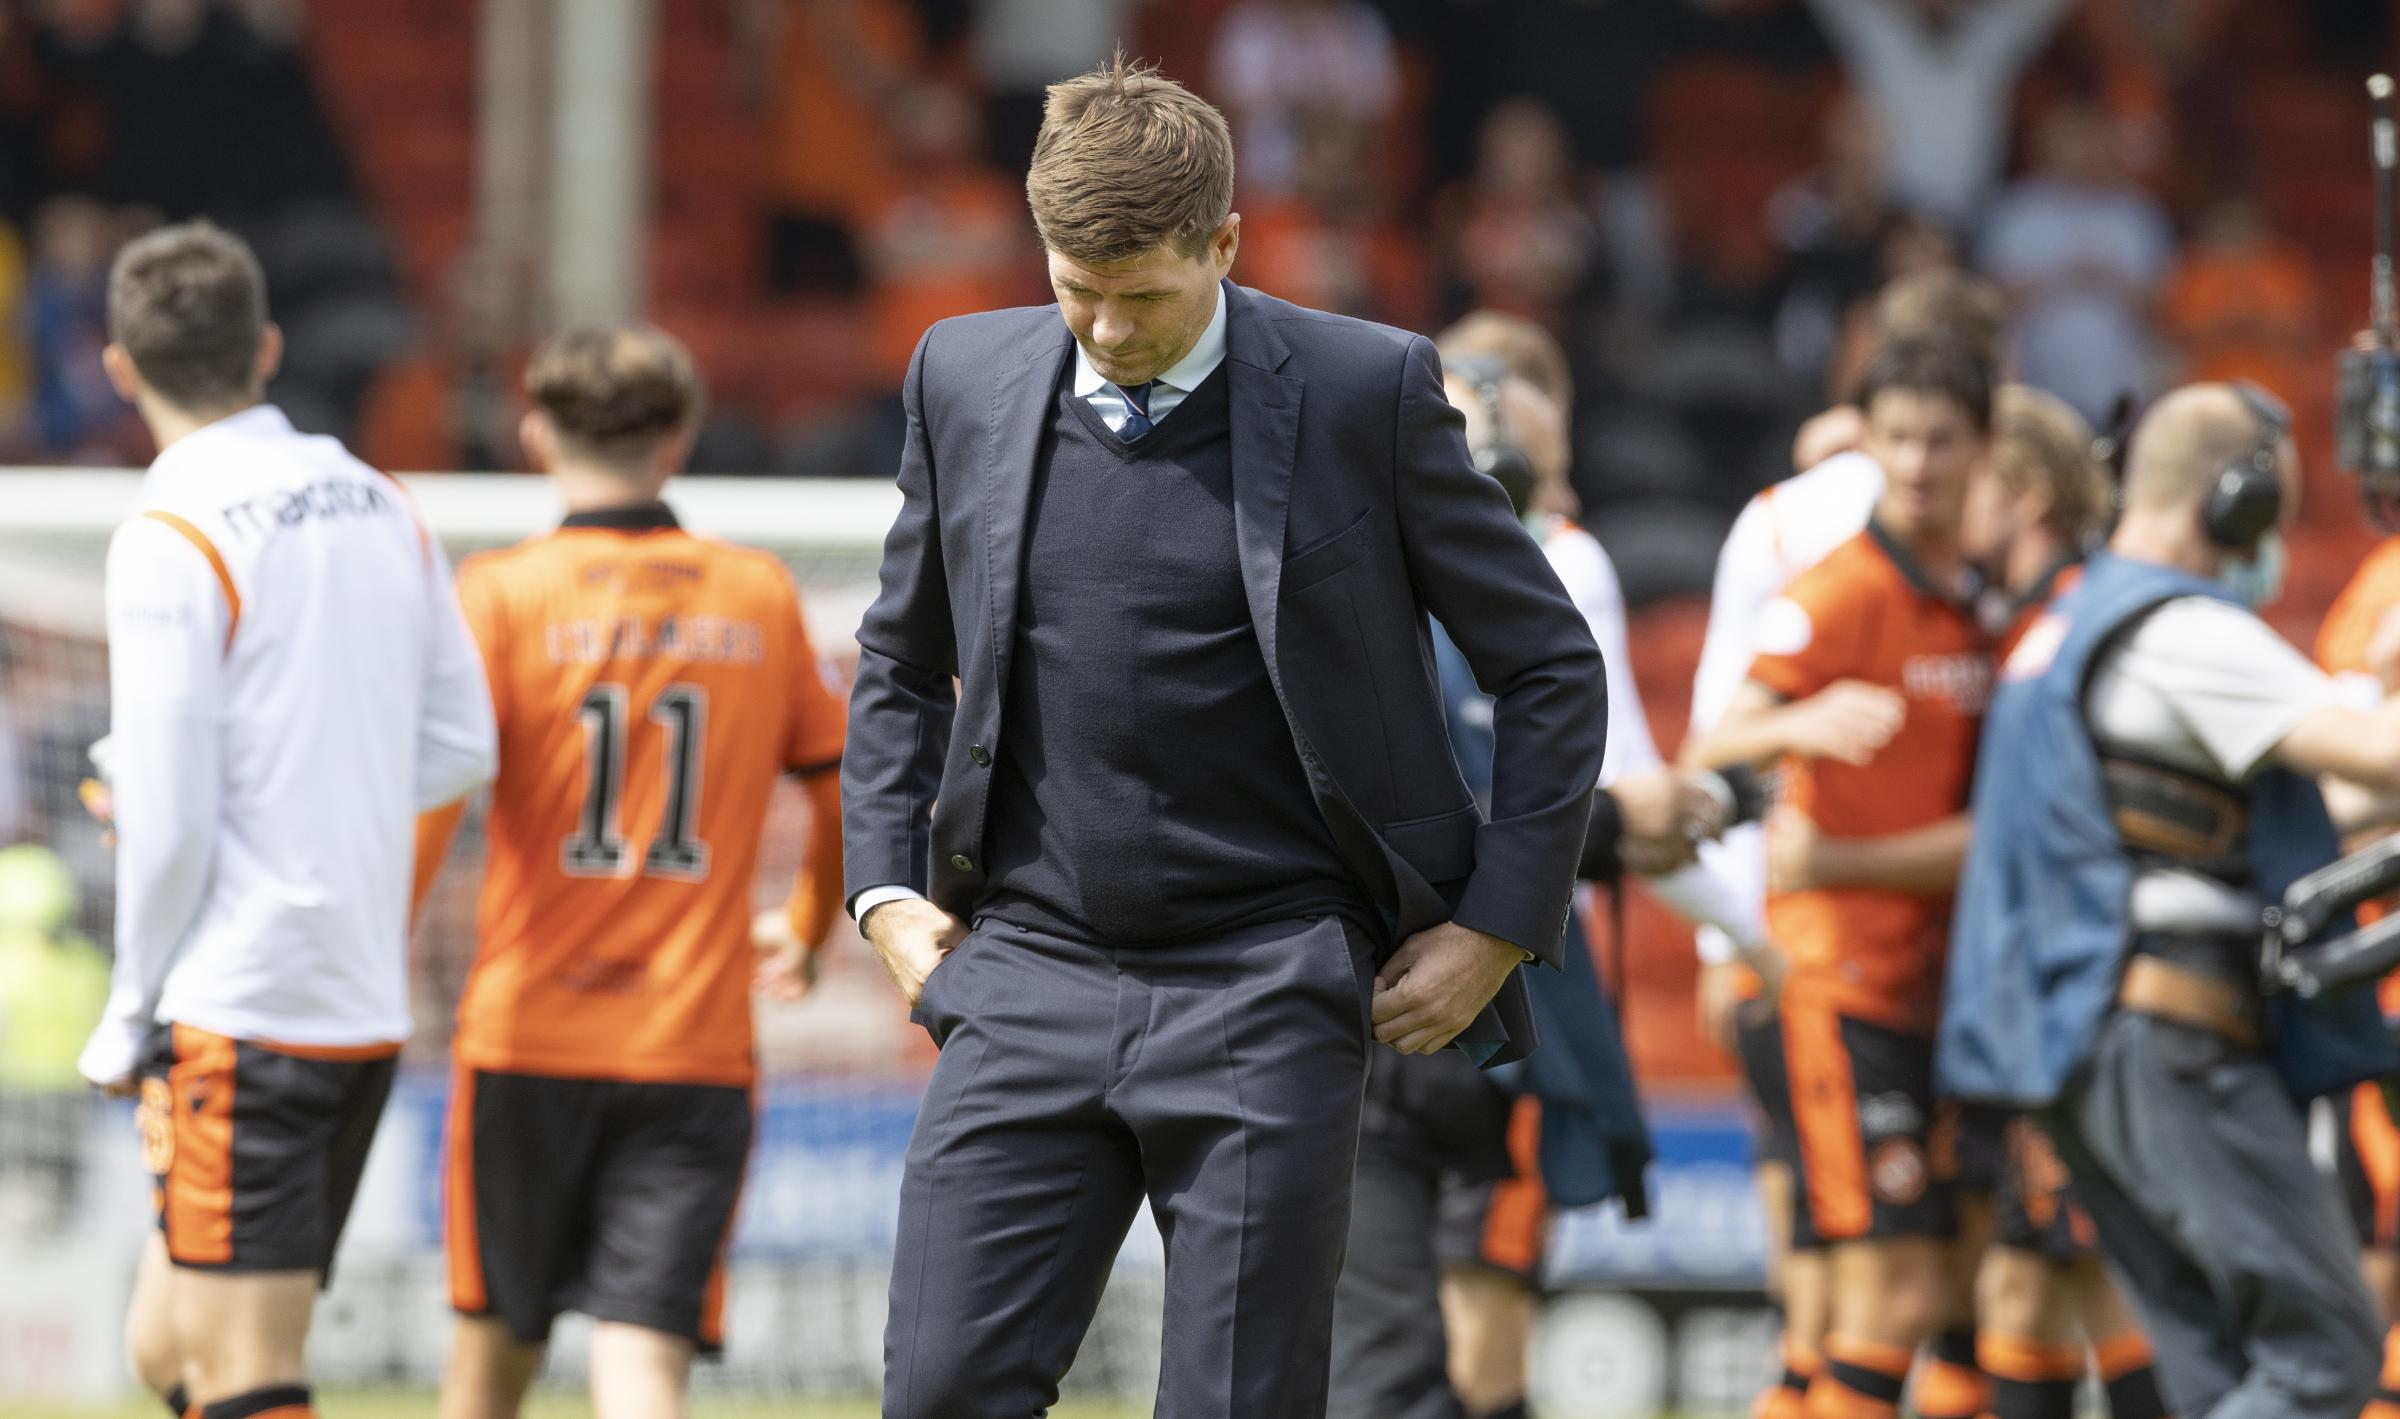 Rangers: Five talking points as Steven Gerrard's side suffer Premiership defeat ahead of Champions League clash